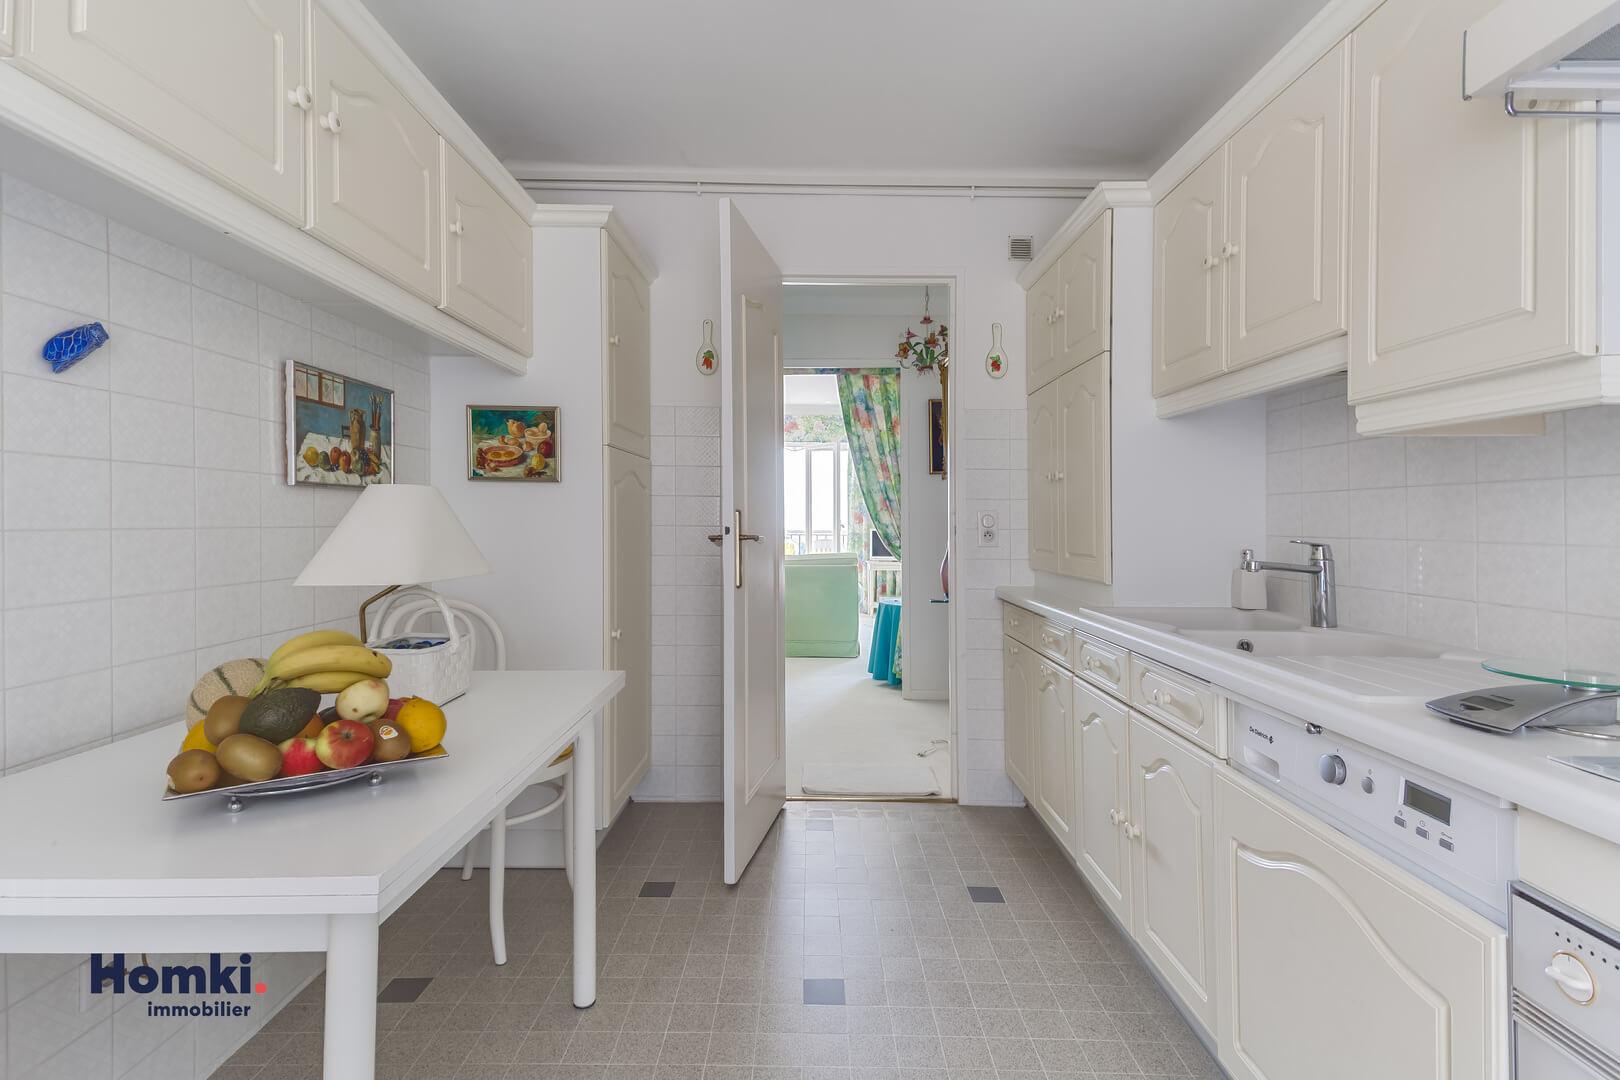 Vente appartement Grasse T3 06520 French Riviera_8